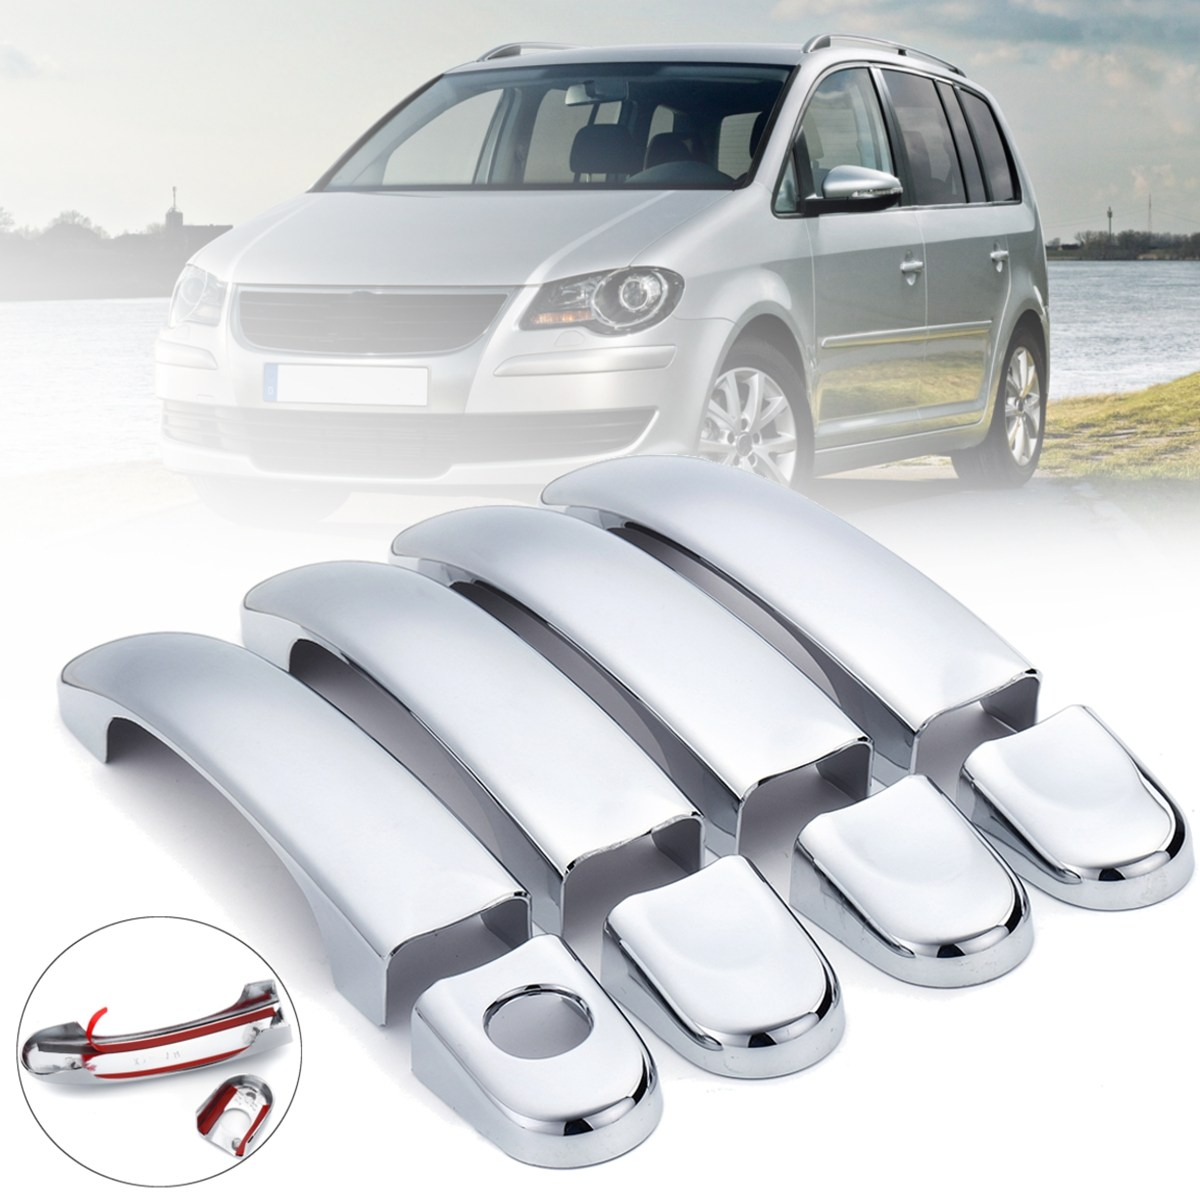 8pcs Chromed Stainless Steel Door Handle Cover Trim Set For VW Transporter T5 Ca